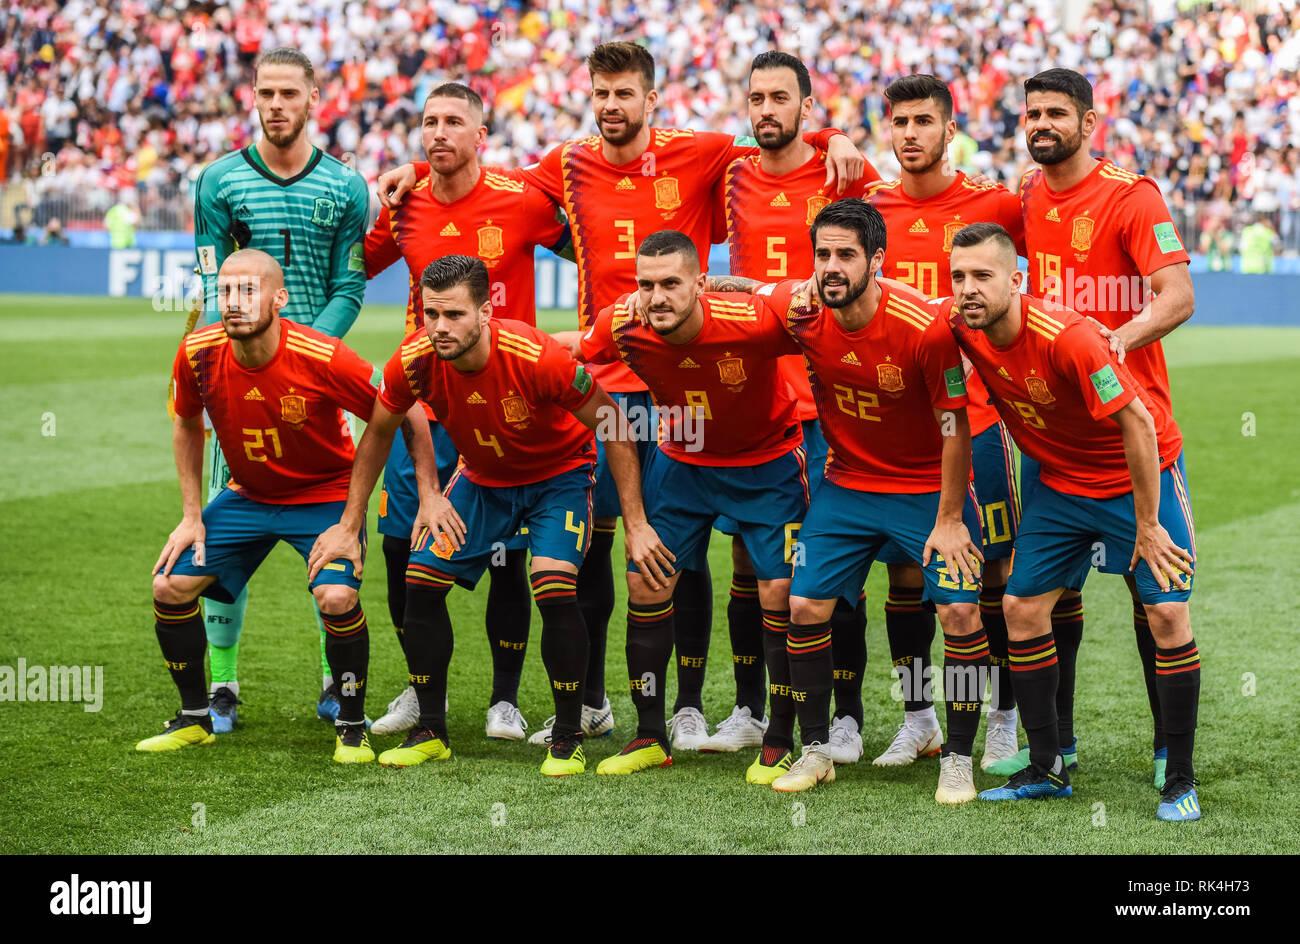 9803022c3af Spain National Team Stock Photos   Spain National Team Stock Images ...